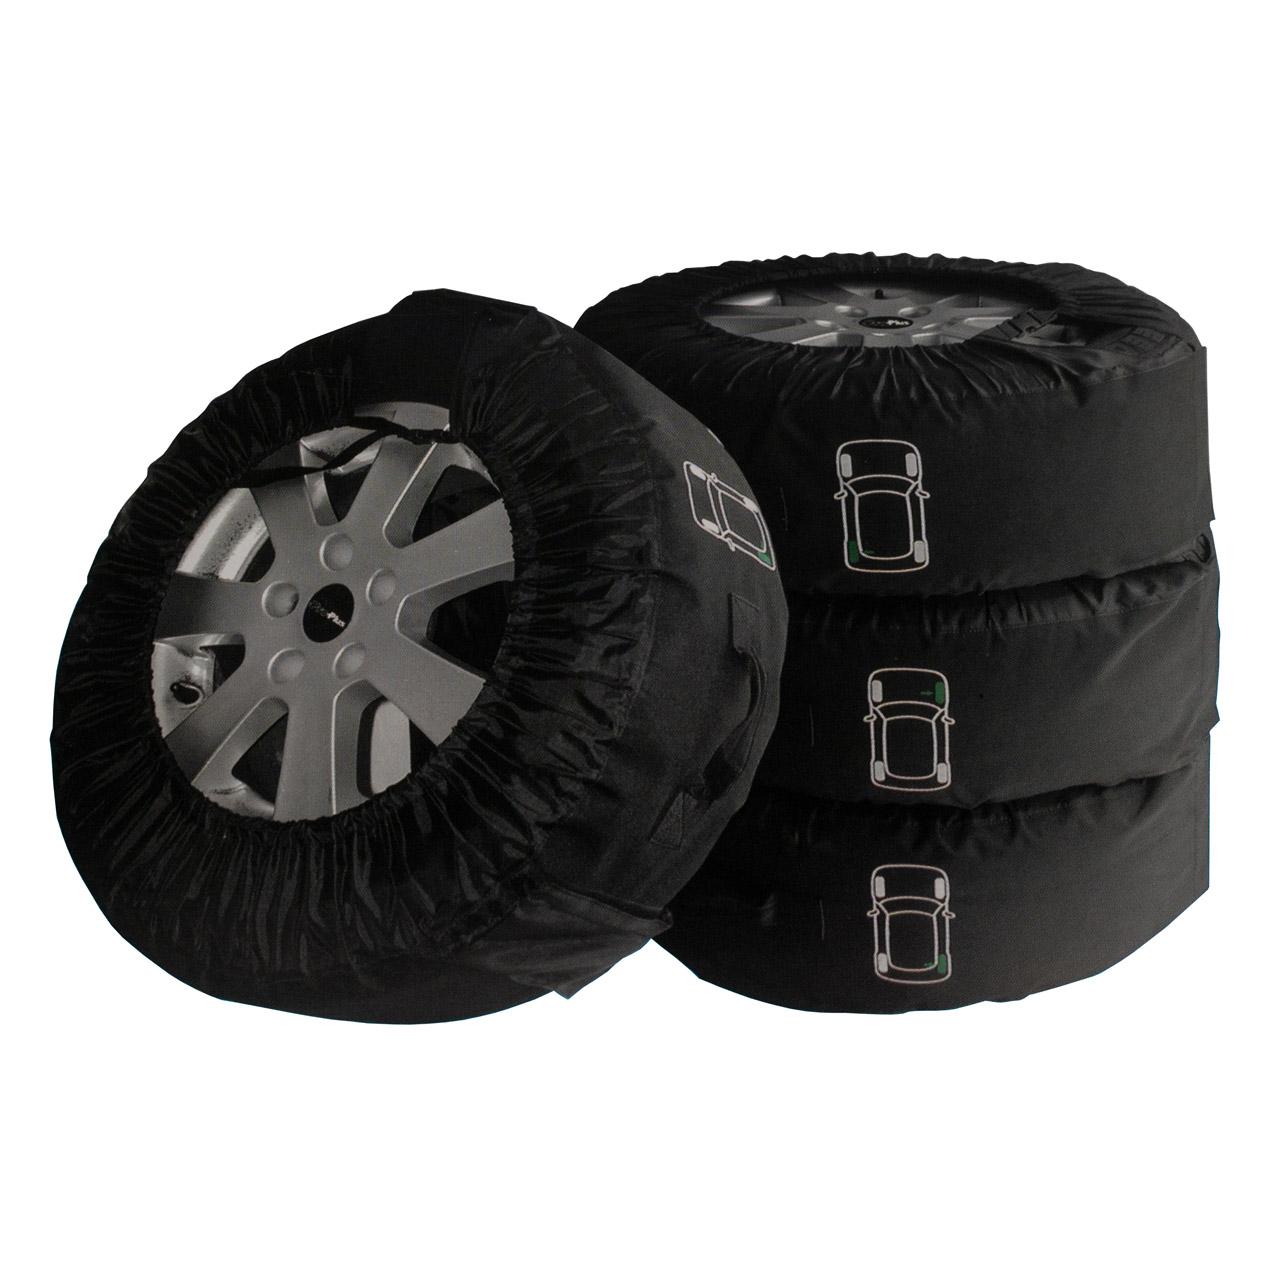 "PROPLUS Reifenhüllen Reifentaschen PROFI Set 4 Stück Set 13""-18"" bis 280mm"